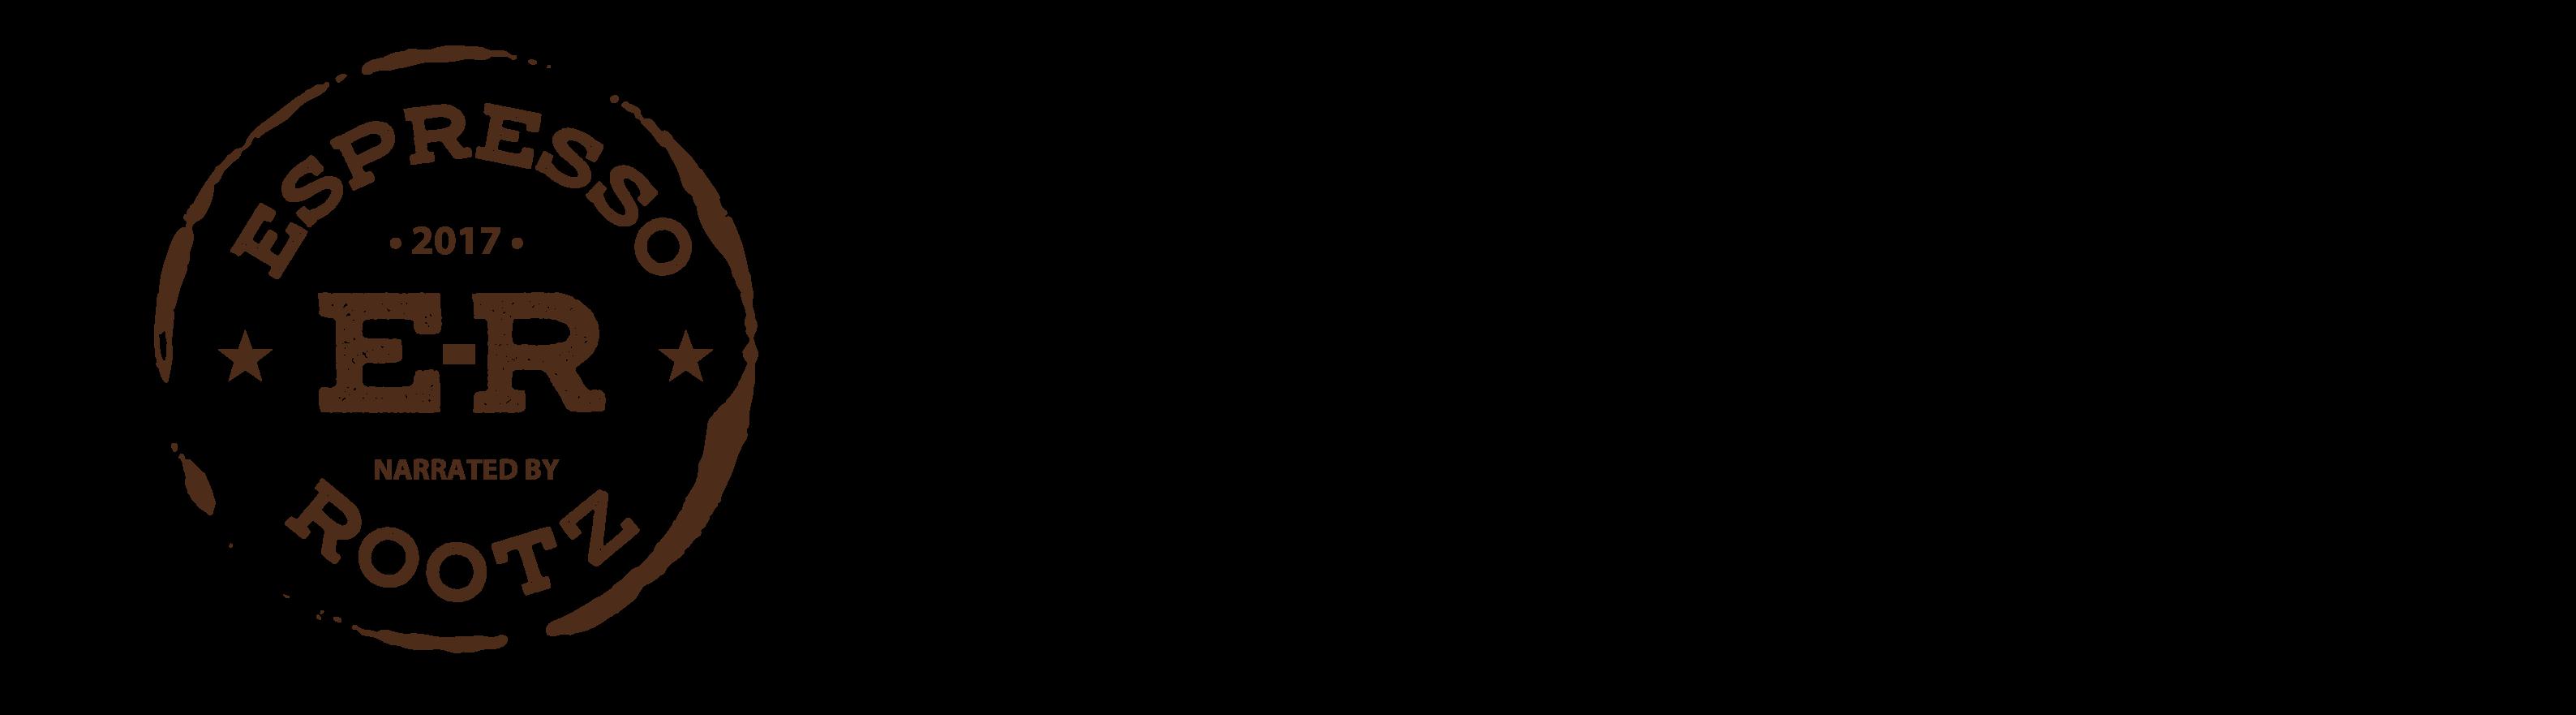 Export-ER-Logo-05